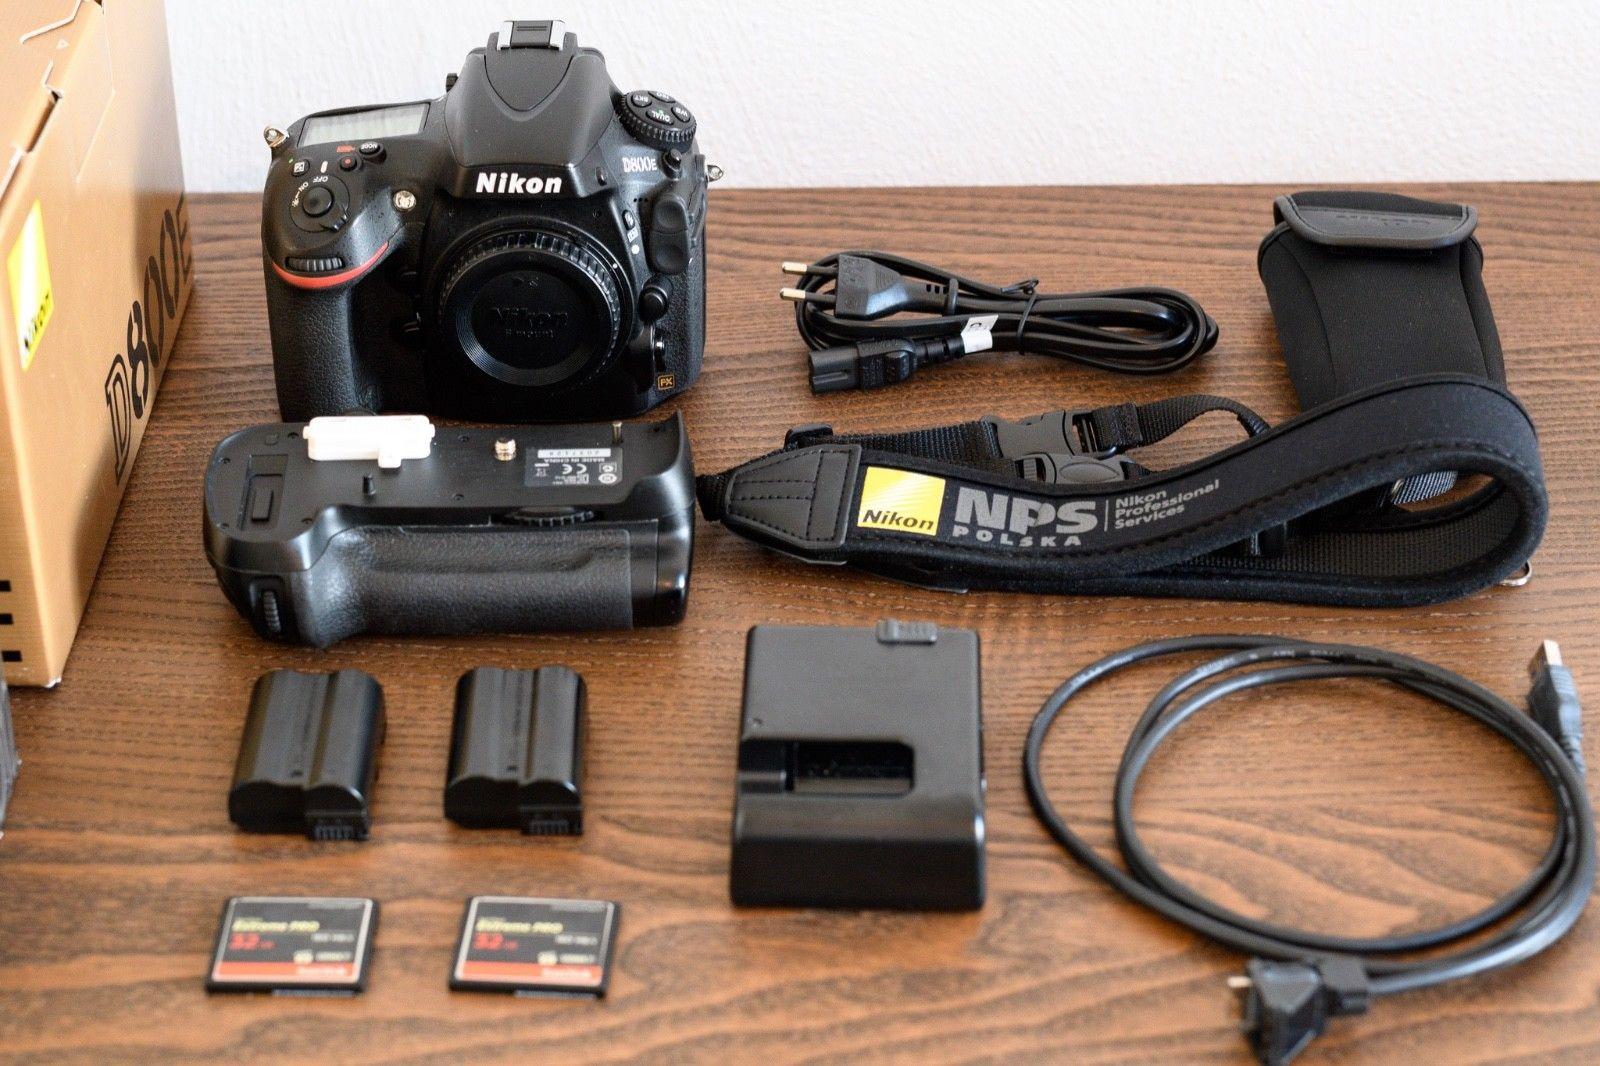 Nikon D800E 36.3 MP - 55k, extra MB-D12 grip, Zubehörpaket (Nur Gehäuse)